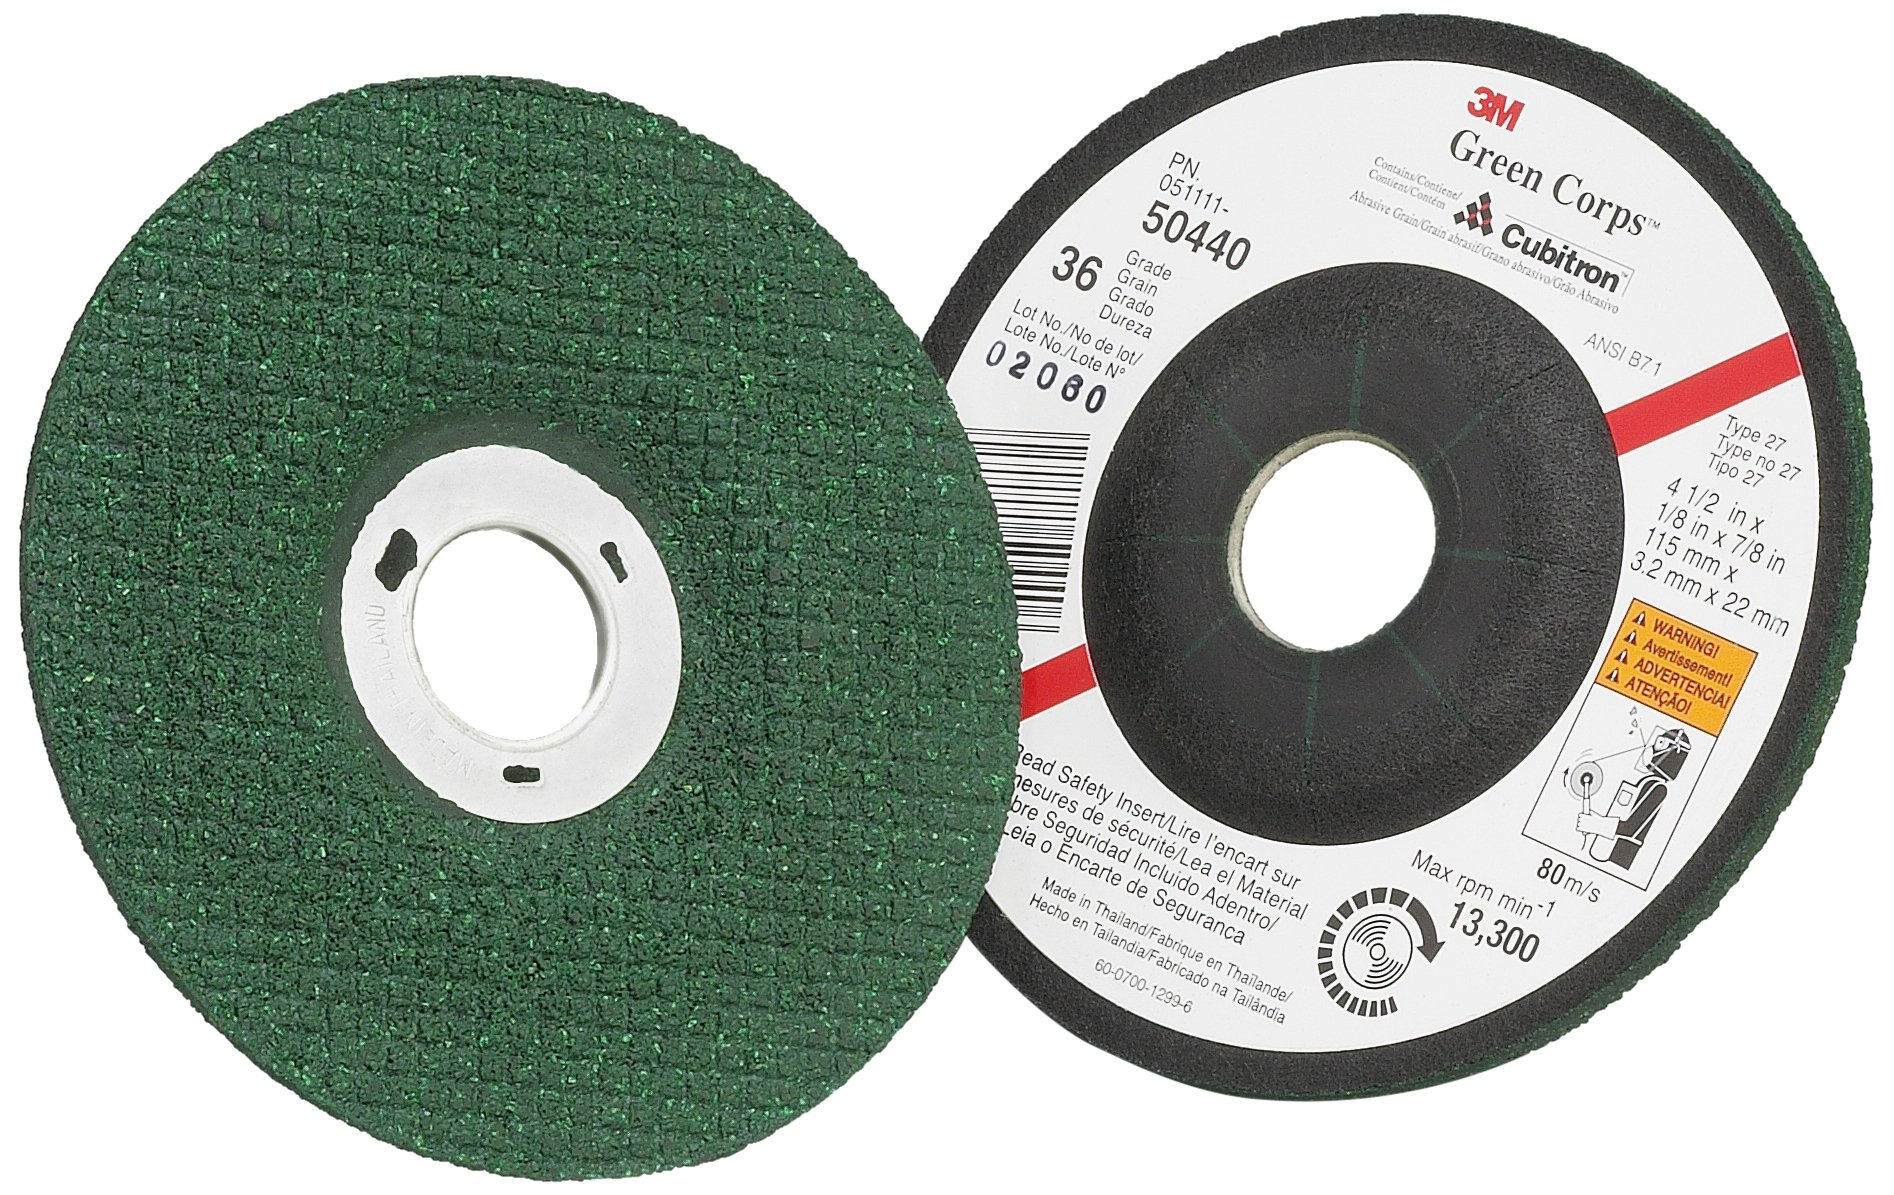 3M(TM) Green Corps(TM) Flexible Grinding